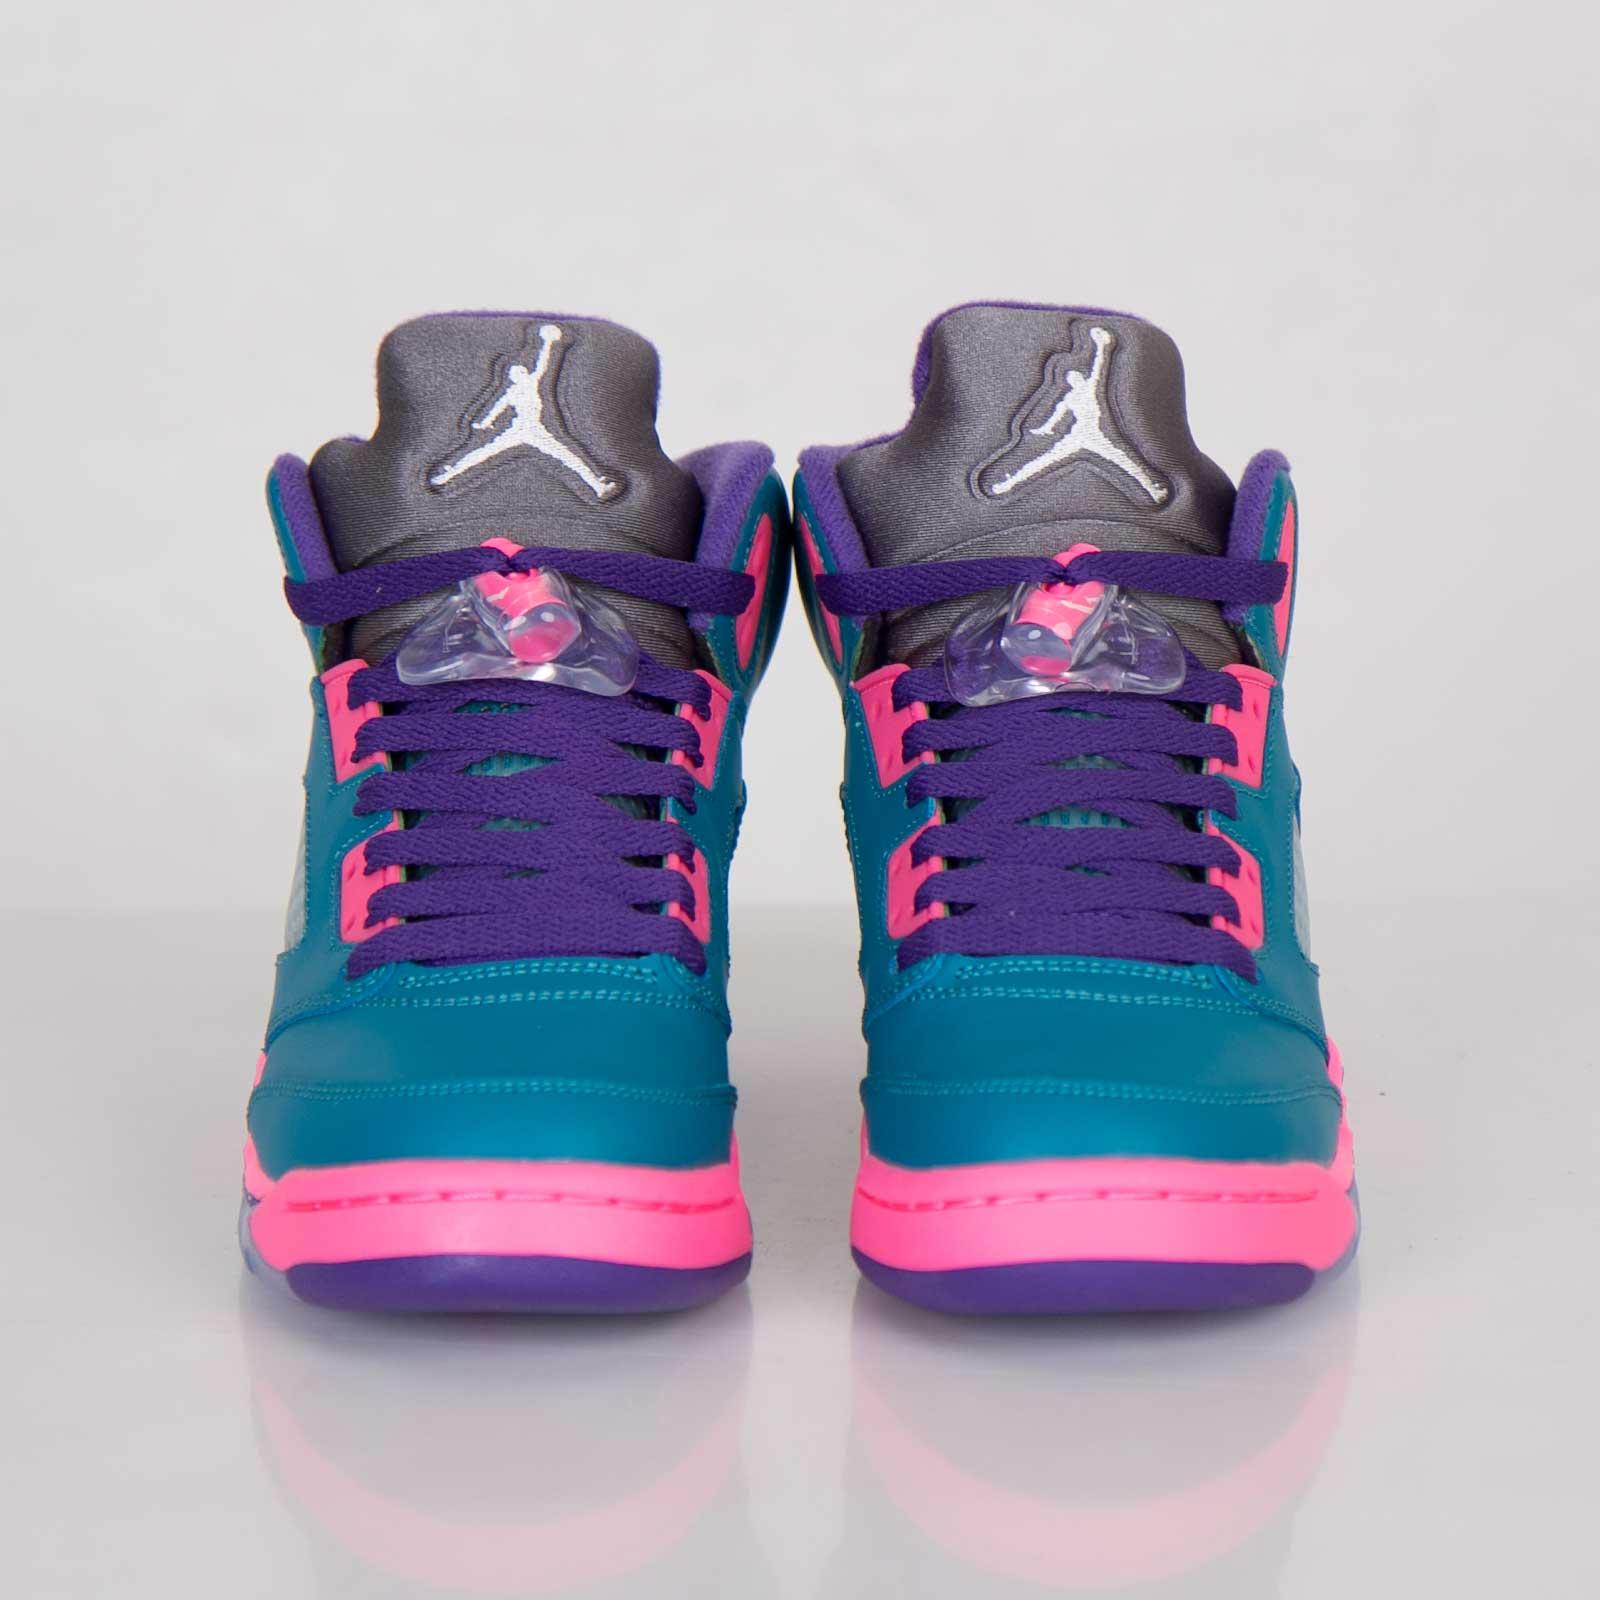 02f093df558ce0 Jordan Brand Girls Air Jordan 5 Retro (GS) - 440892-307 - Sneakersnstuff